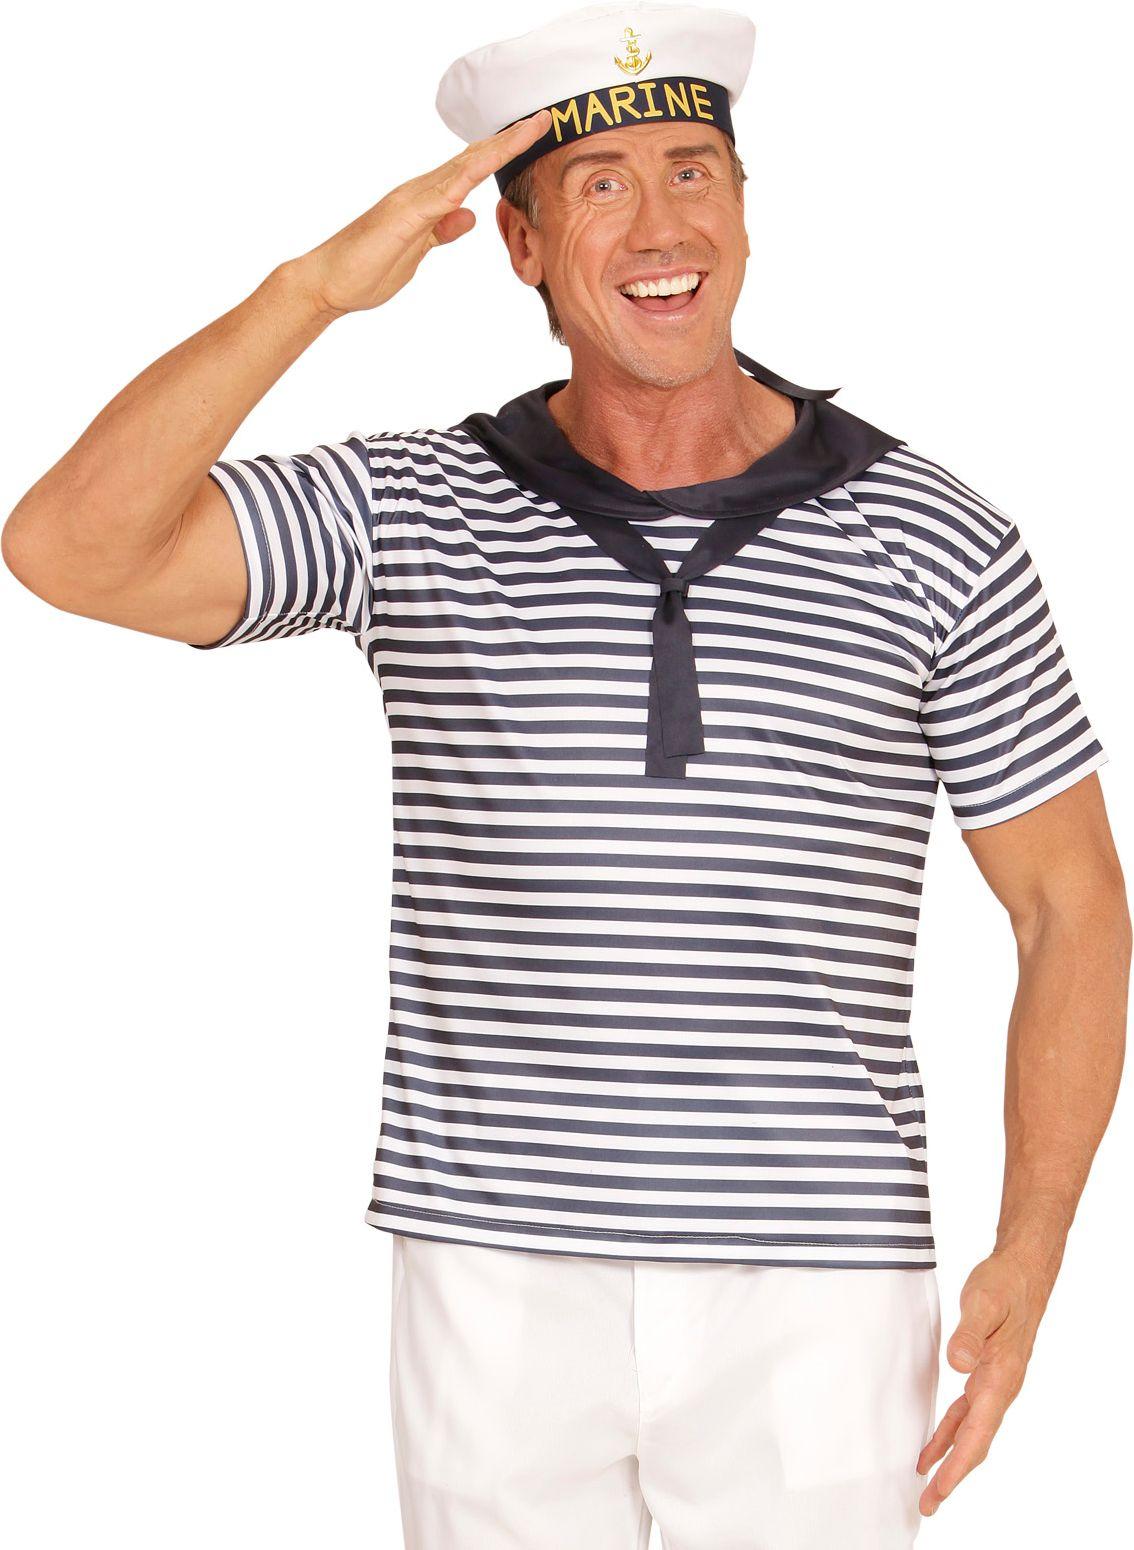 Marine shirt en hoed